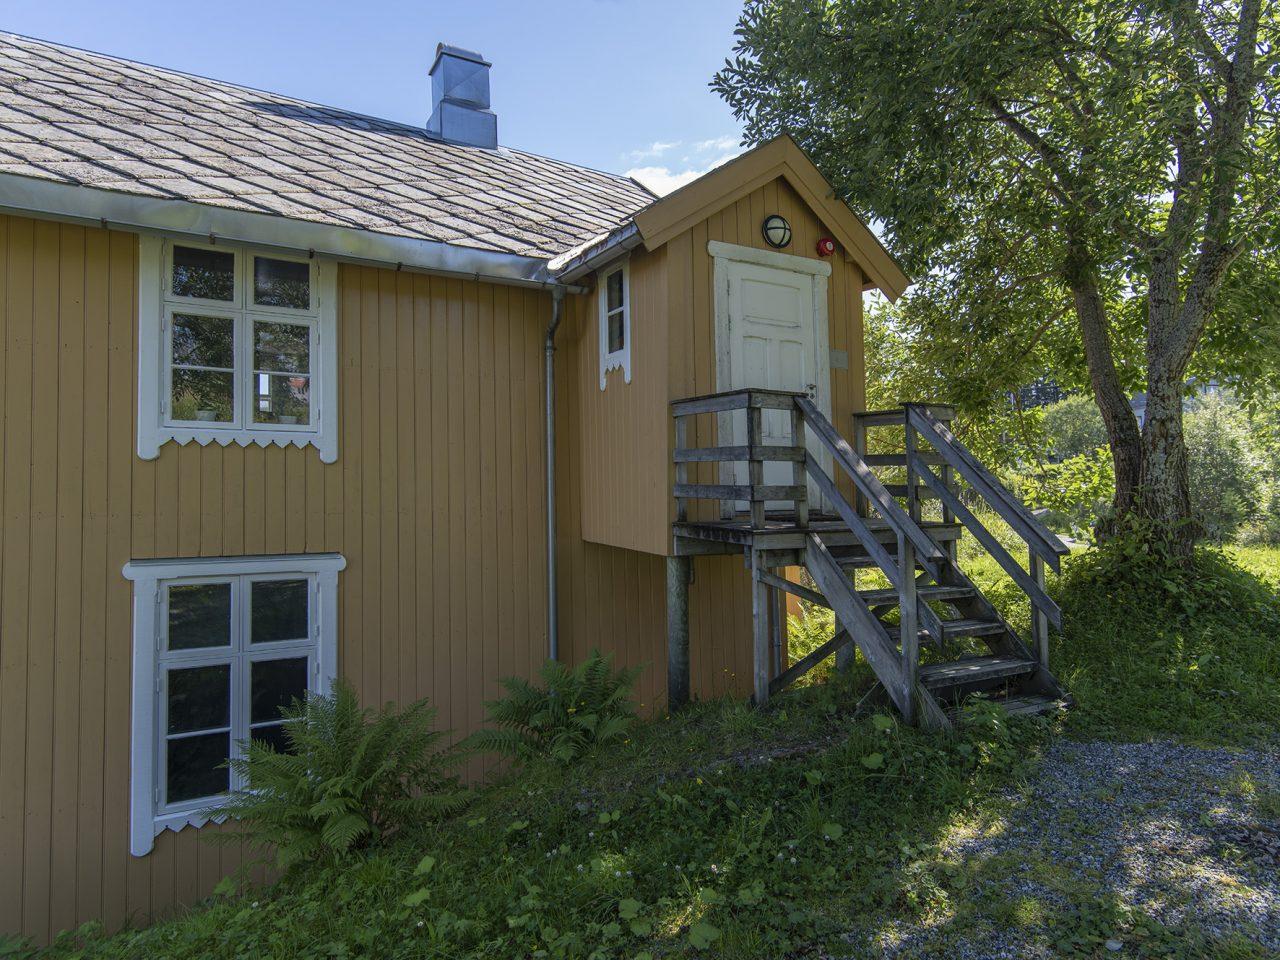 Bergh-brygga, Leirfjord